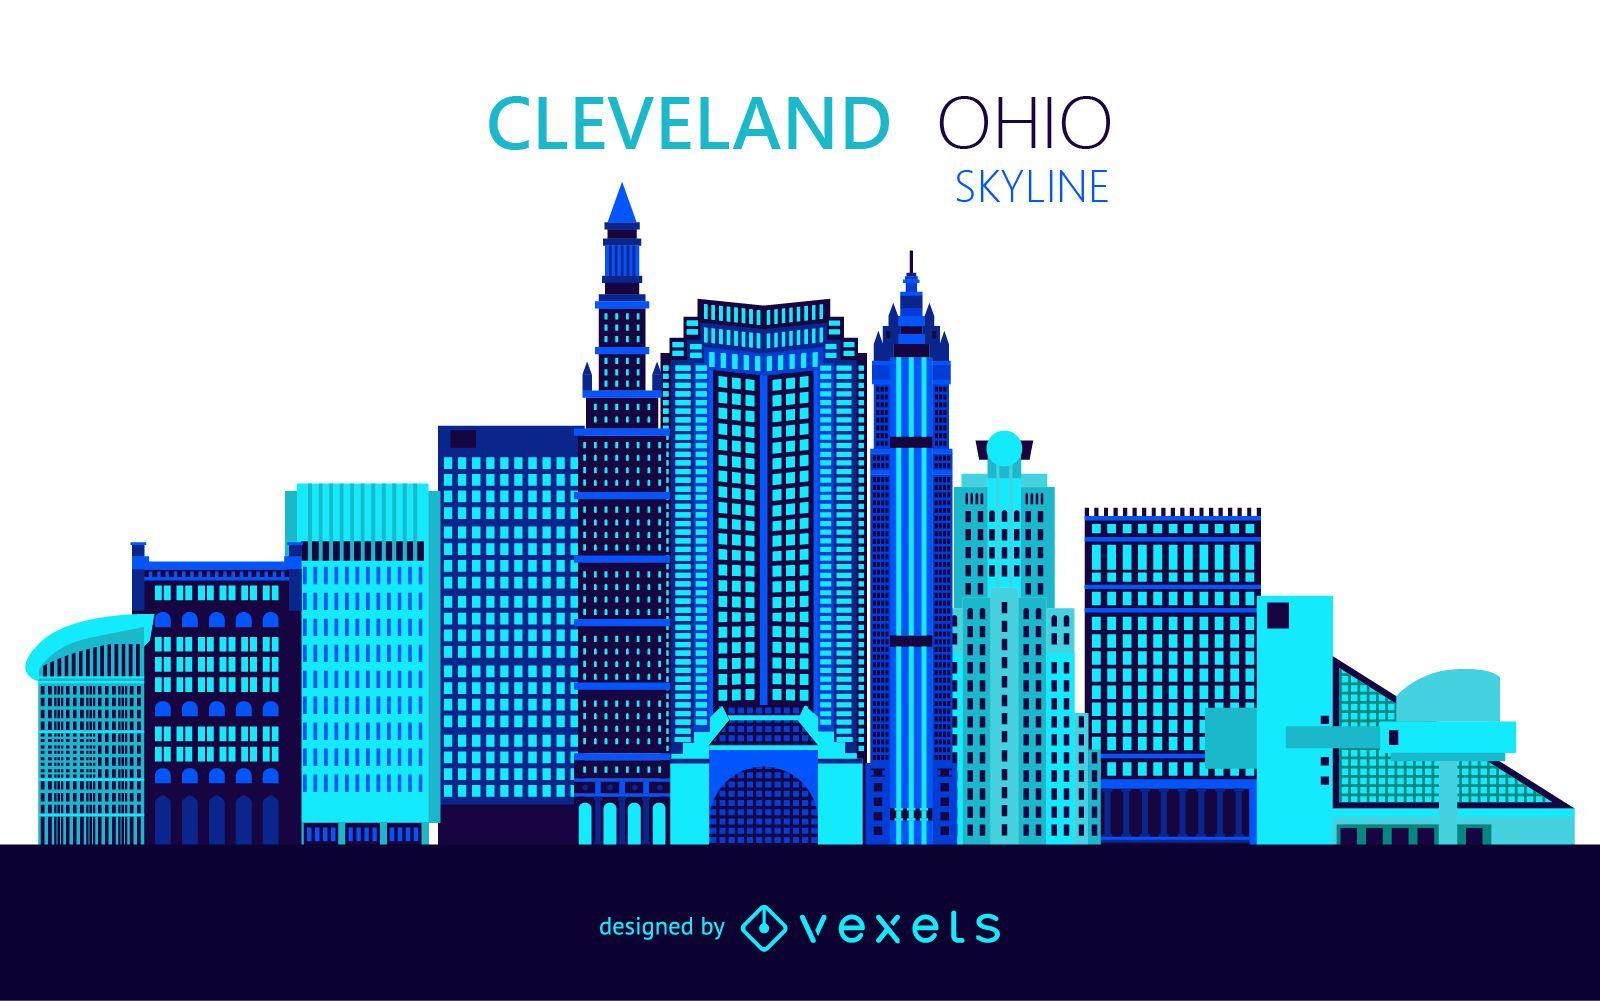 Cleveland skyline illustration